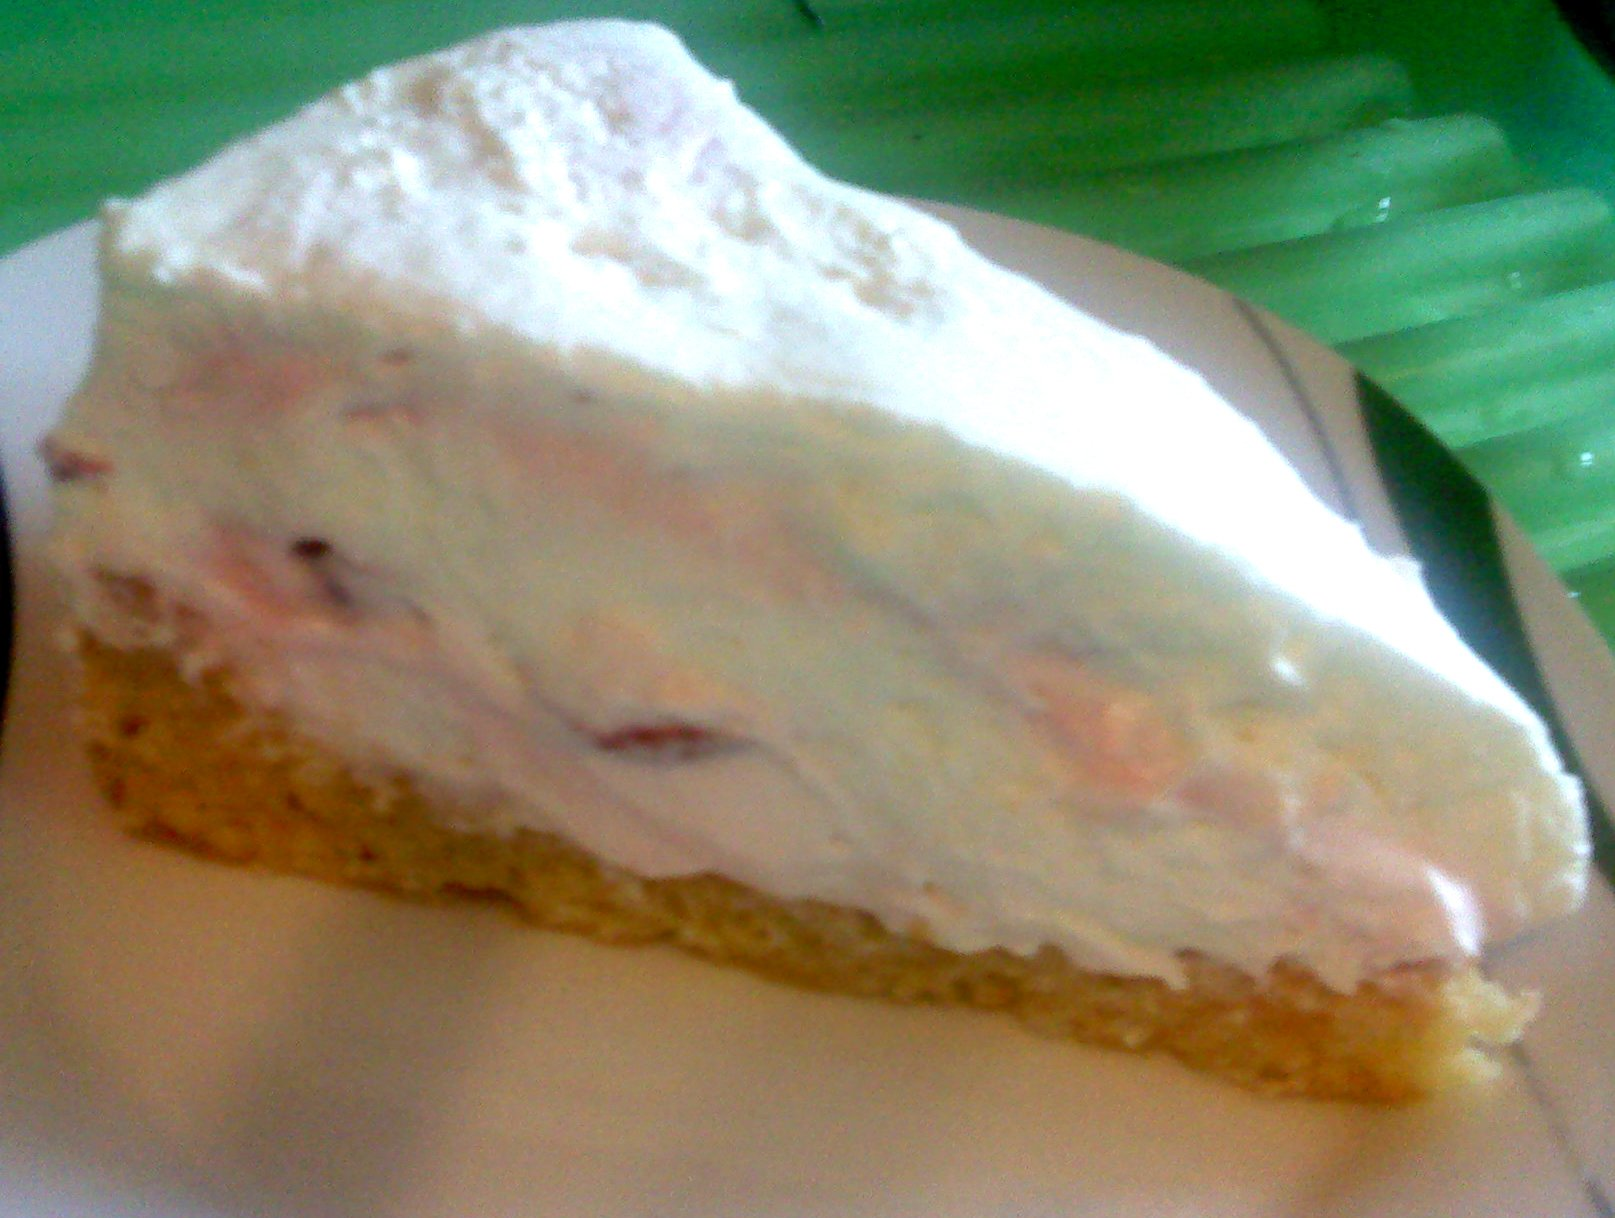 Recept Smetanovo-tvarohový dort s jahodami  - Smetanovo-tvarohový dort s jahodami